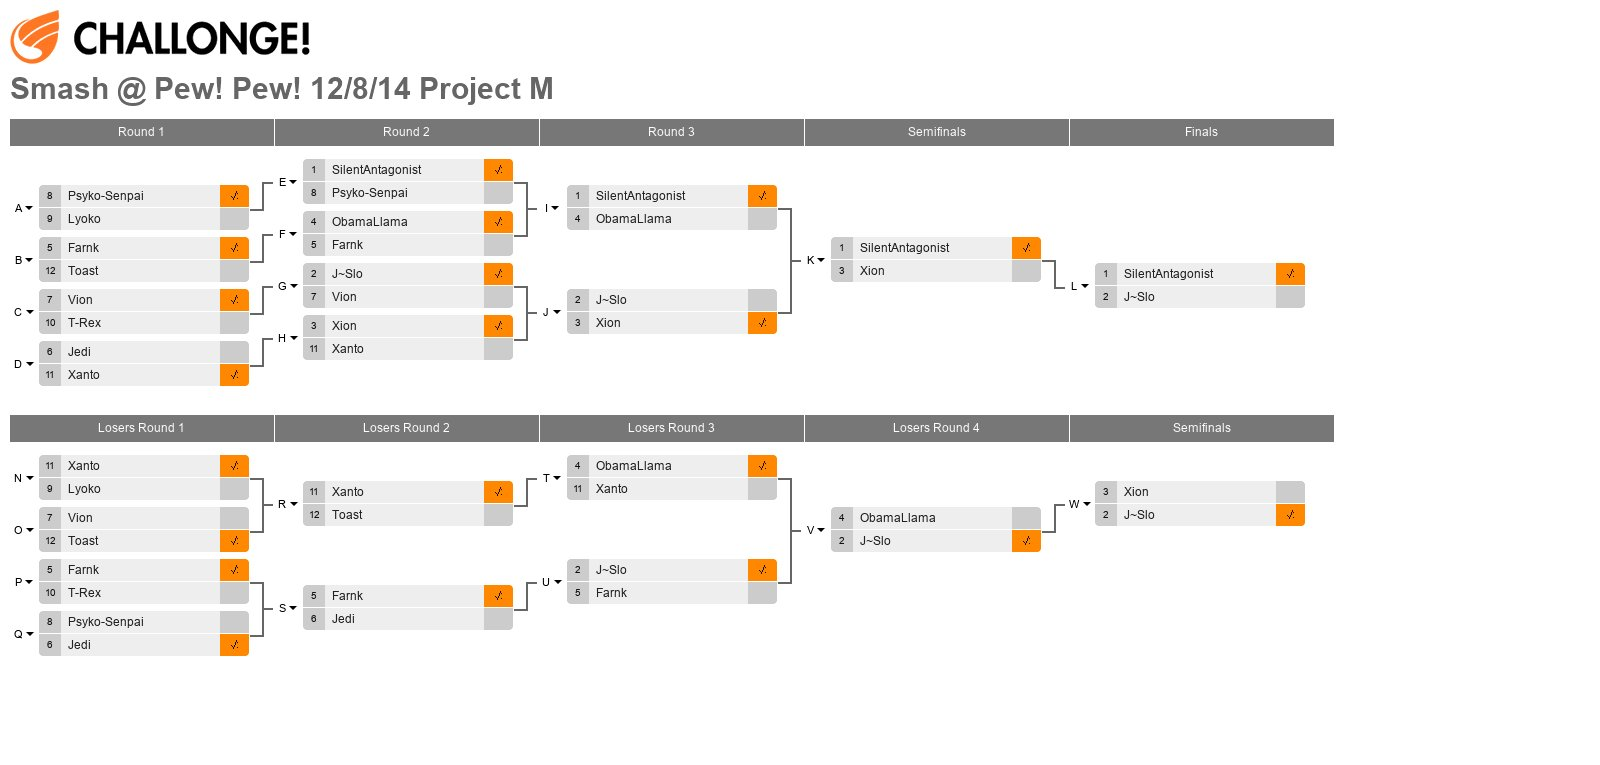 Smash @ Pew! Pew! 12/8/14 Project M